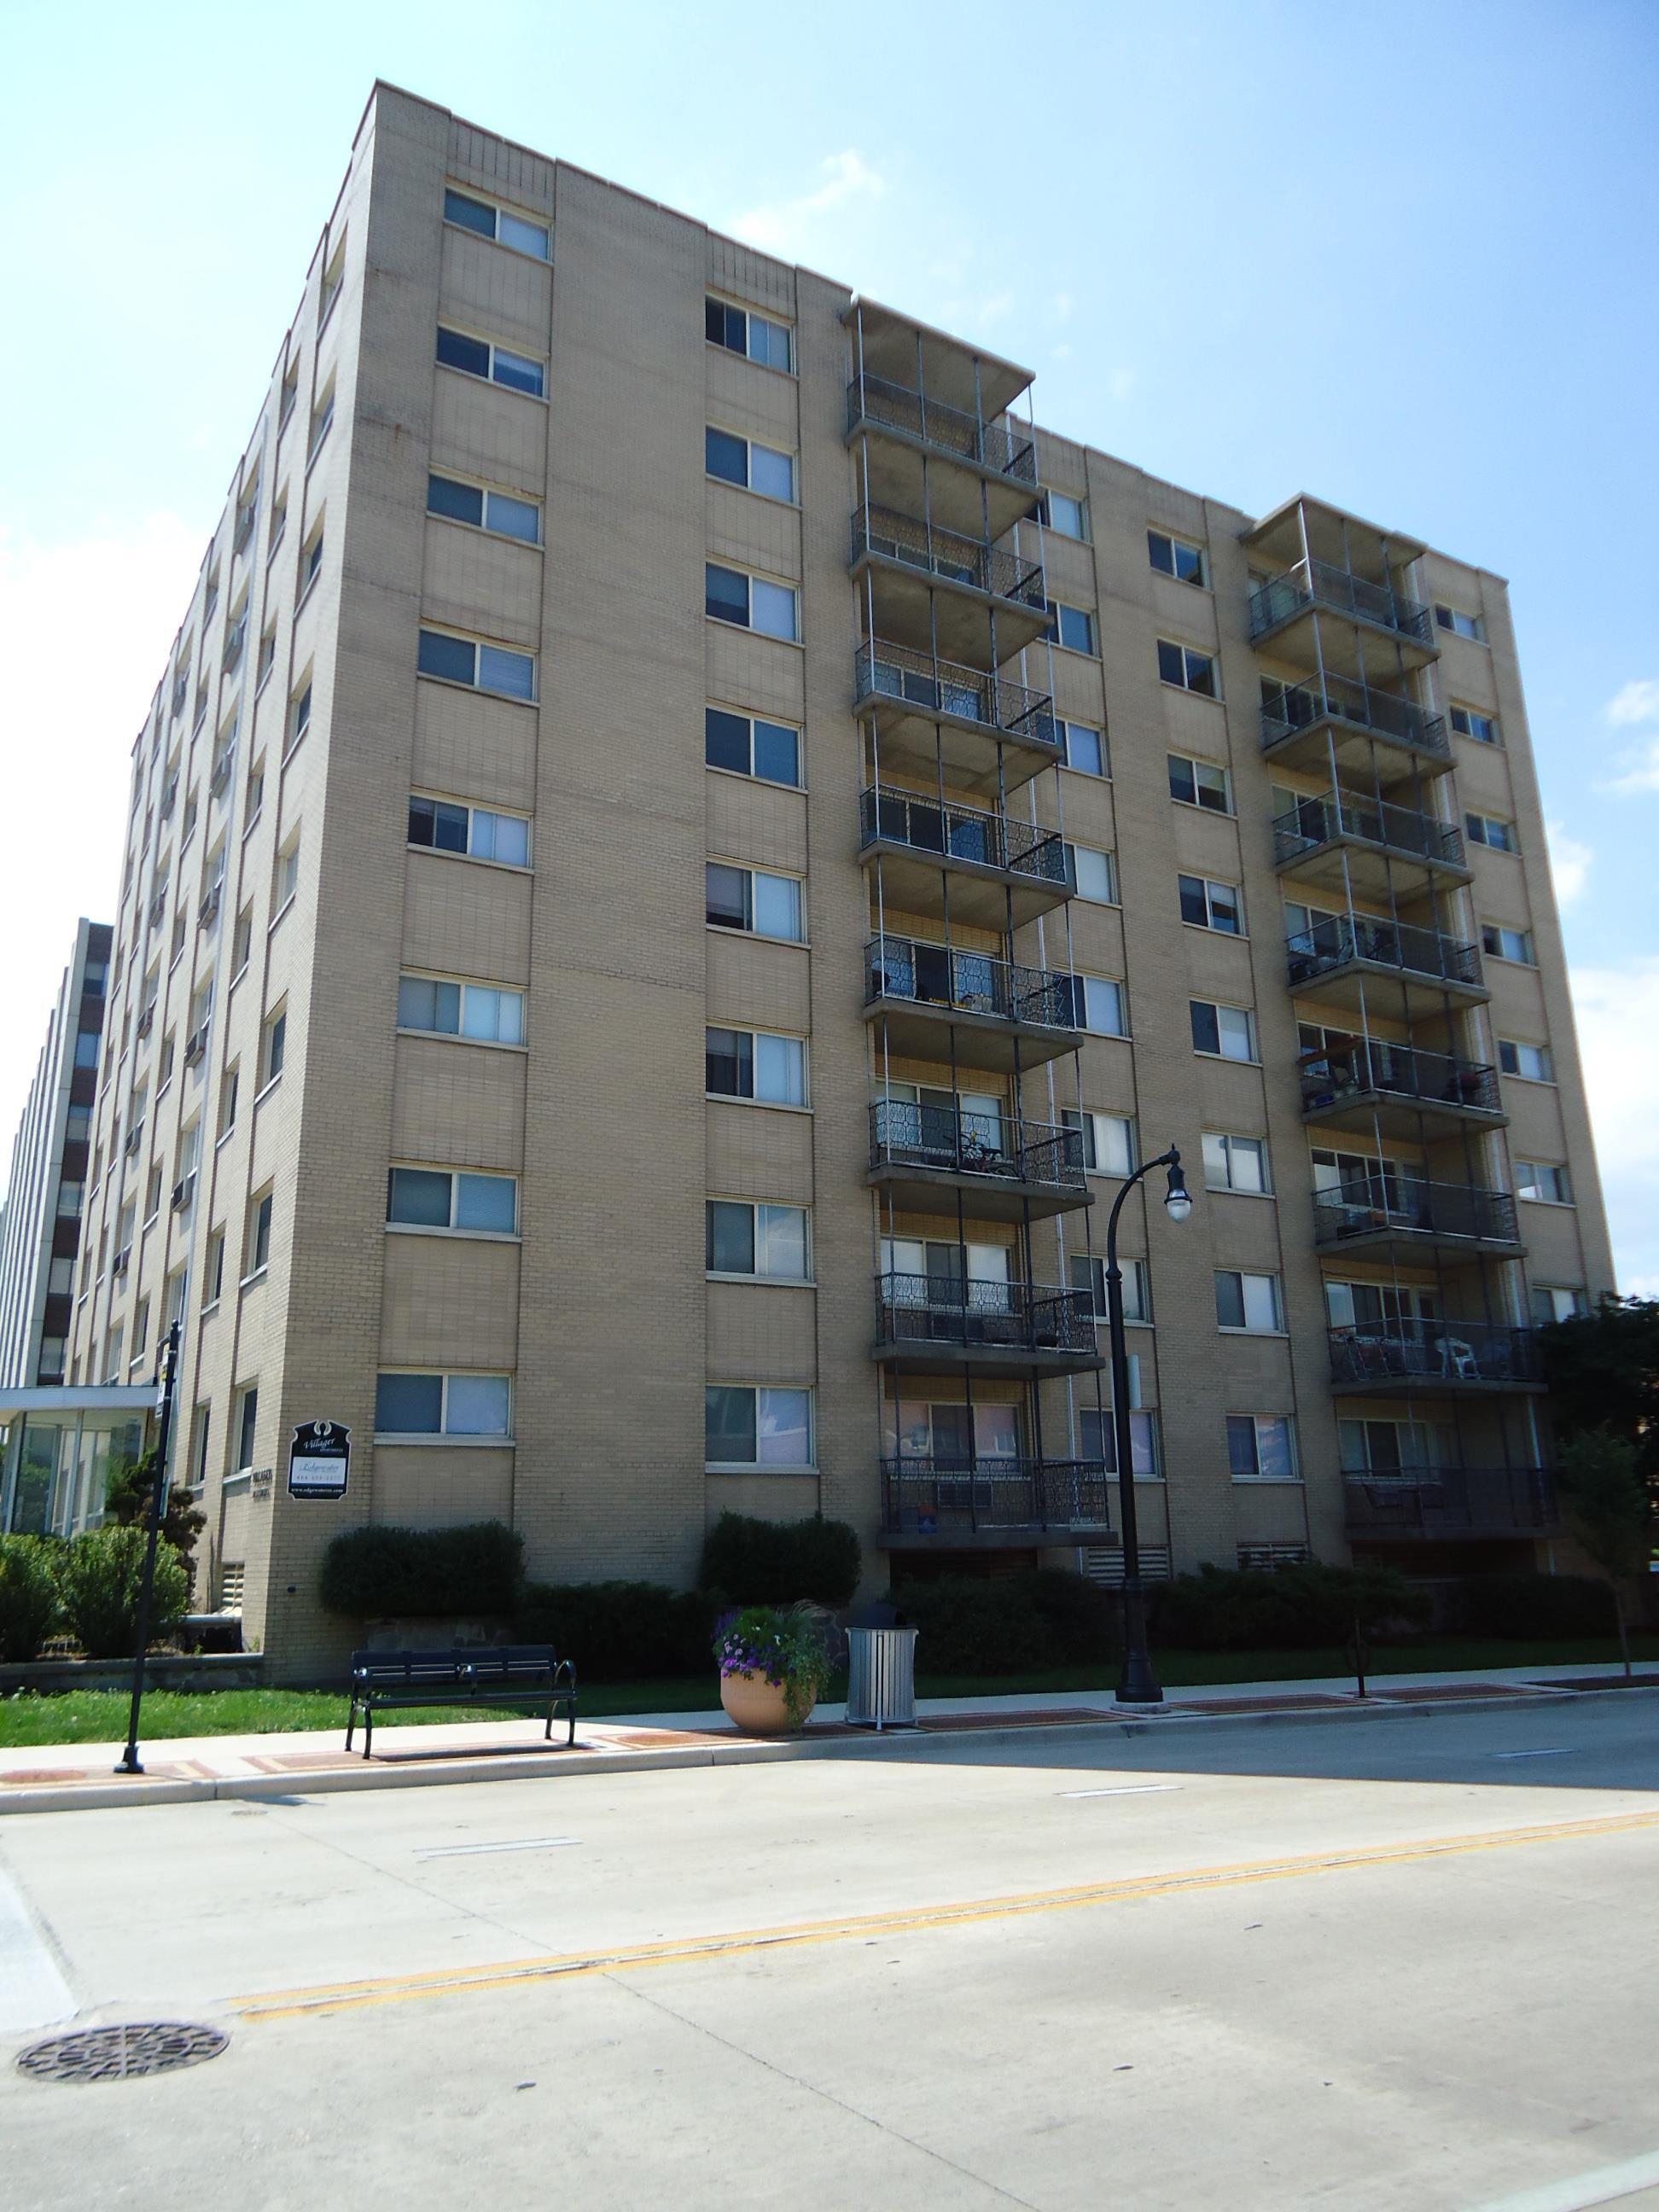 3955 N. Murray Ave.